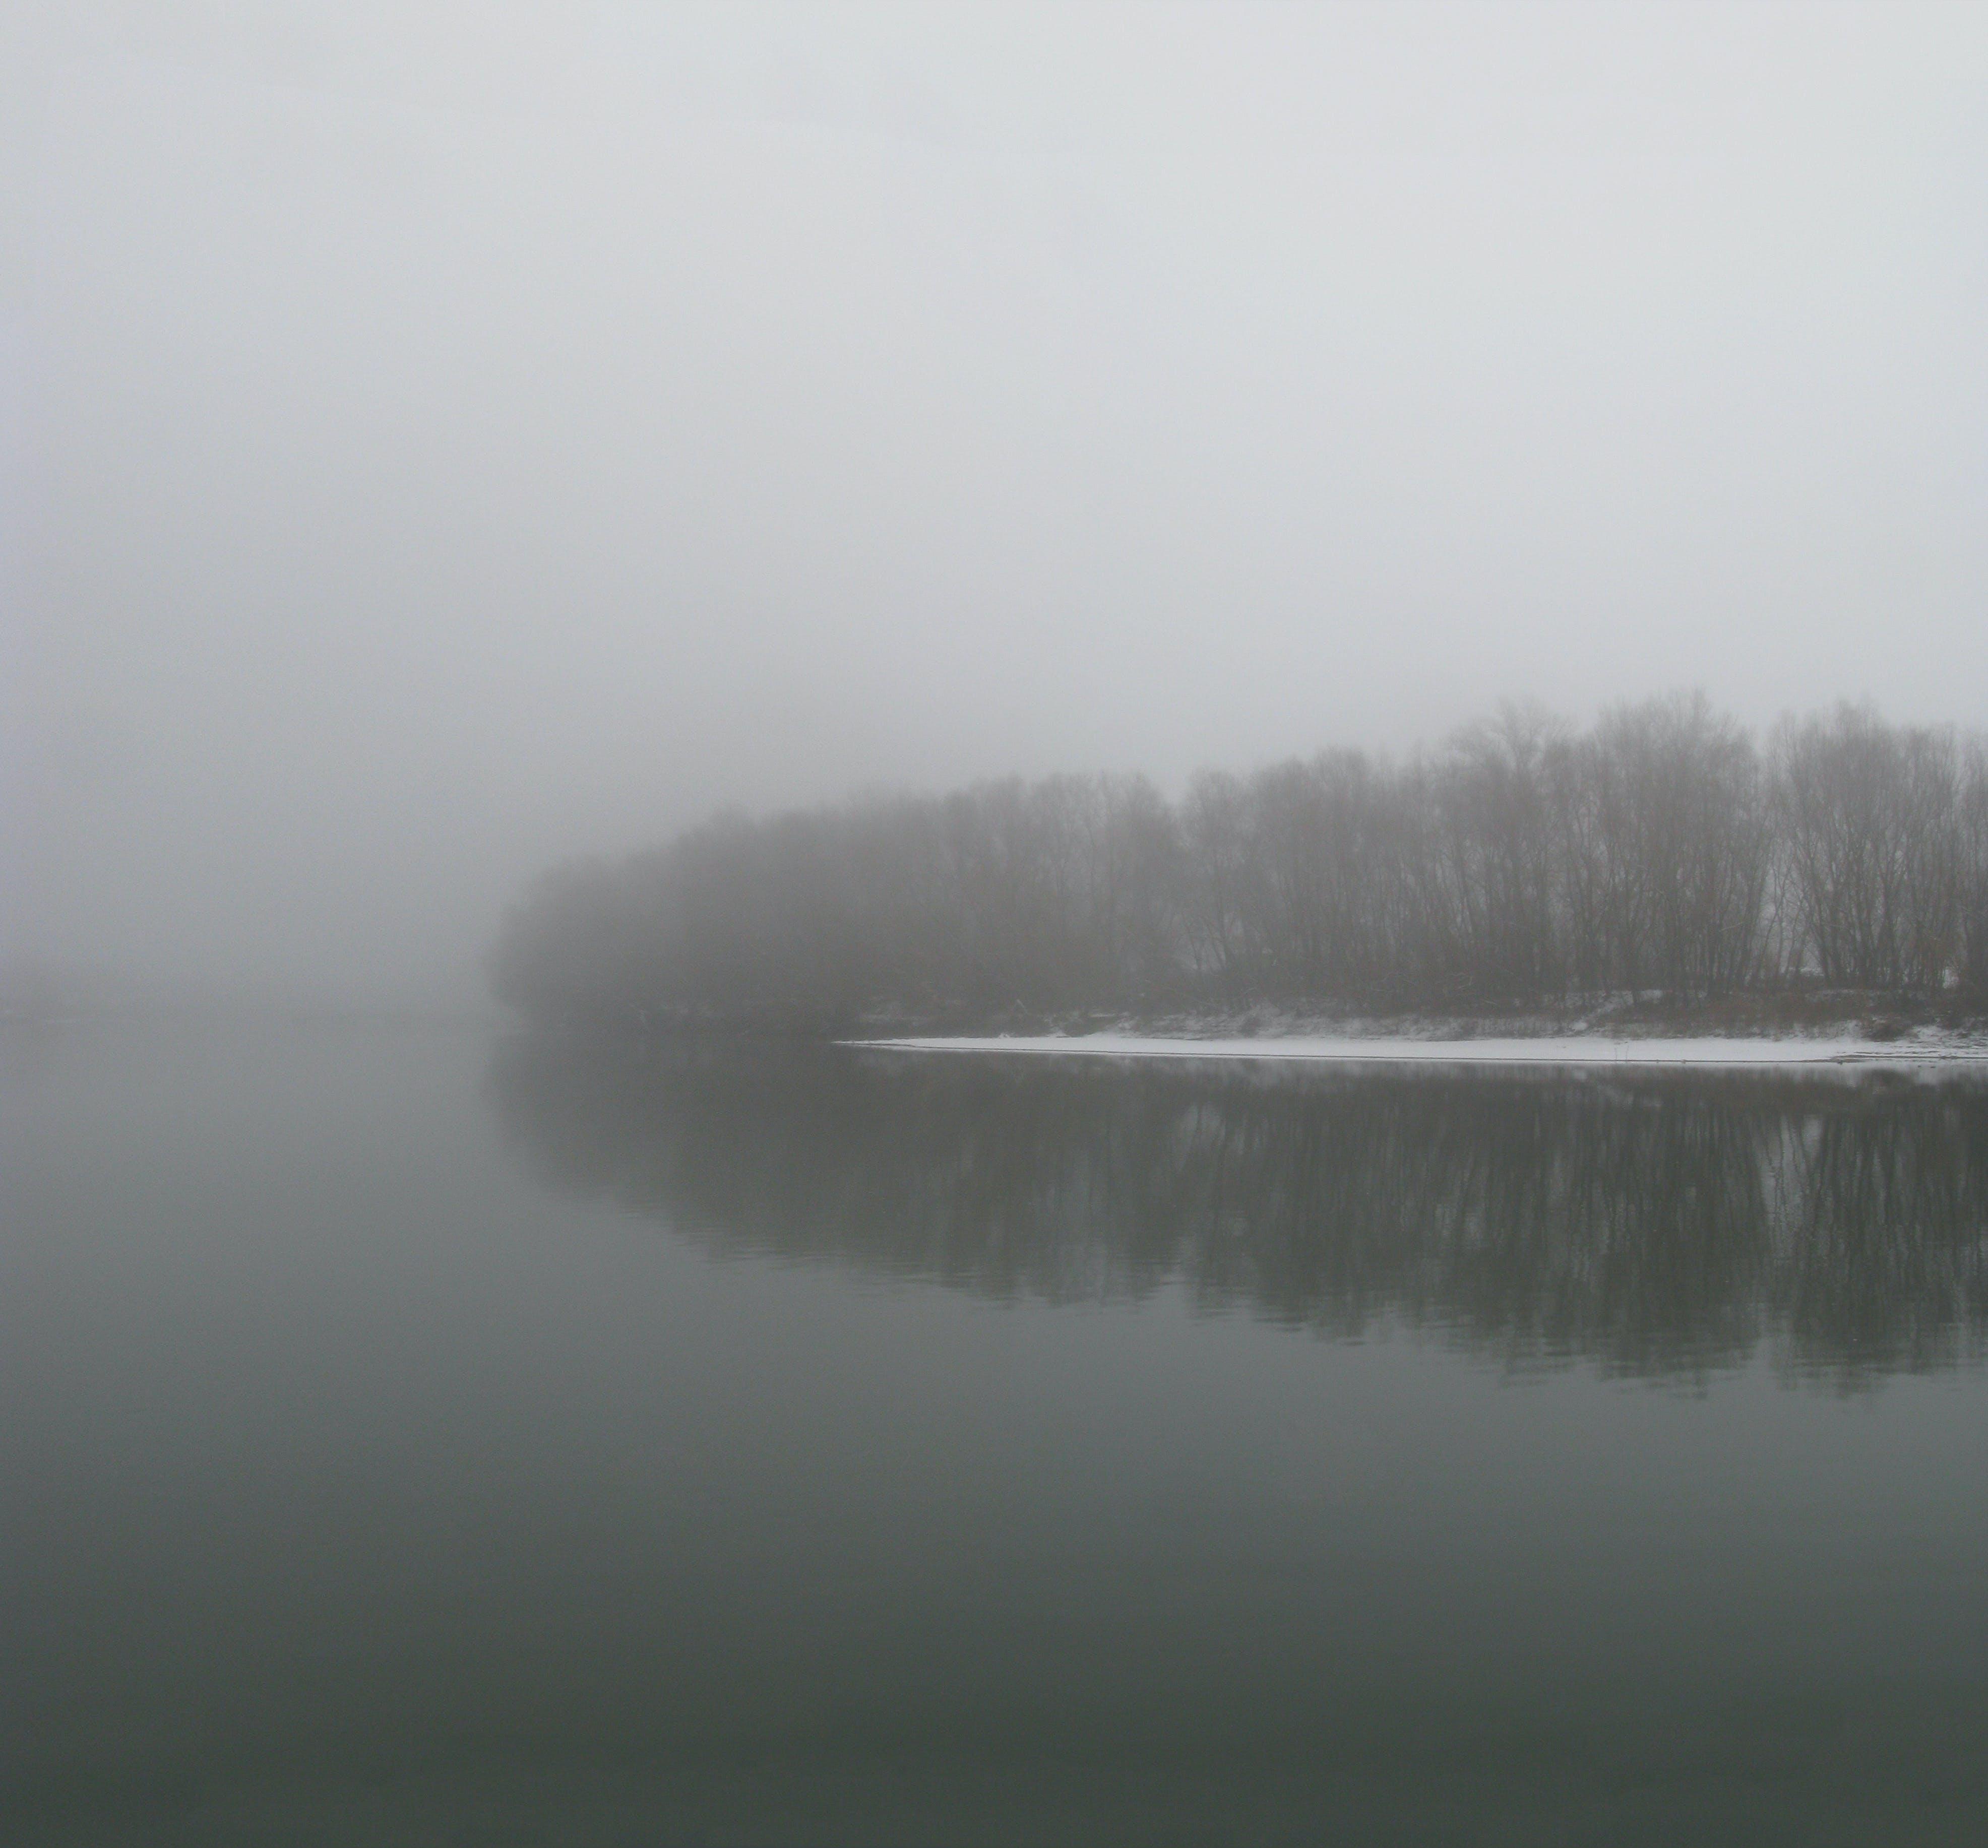 Free stock photo of fog, foggy, frozen, grey sky